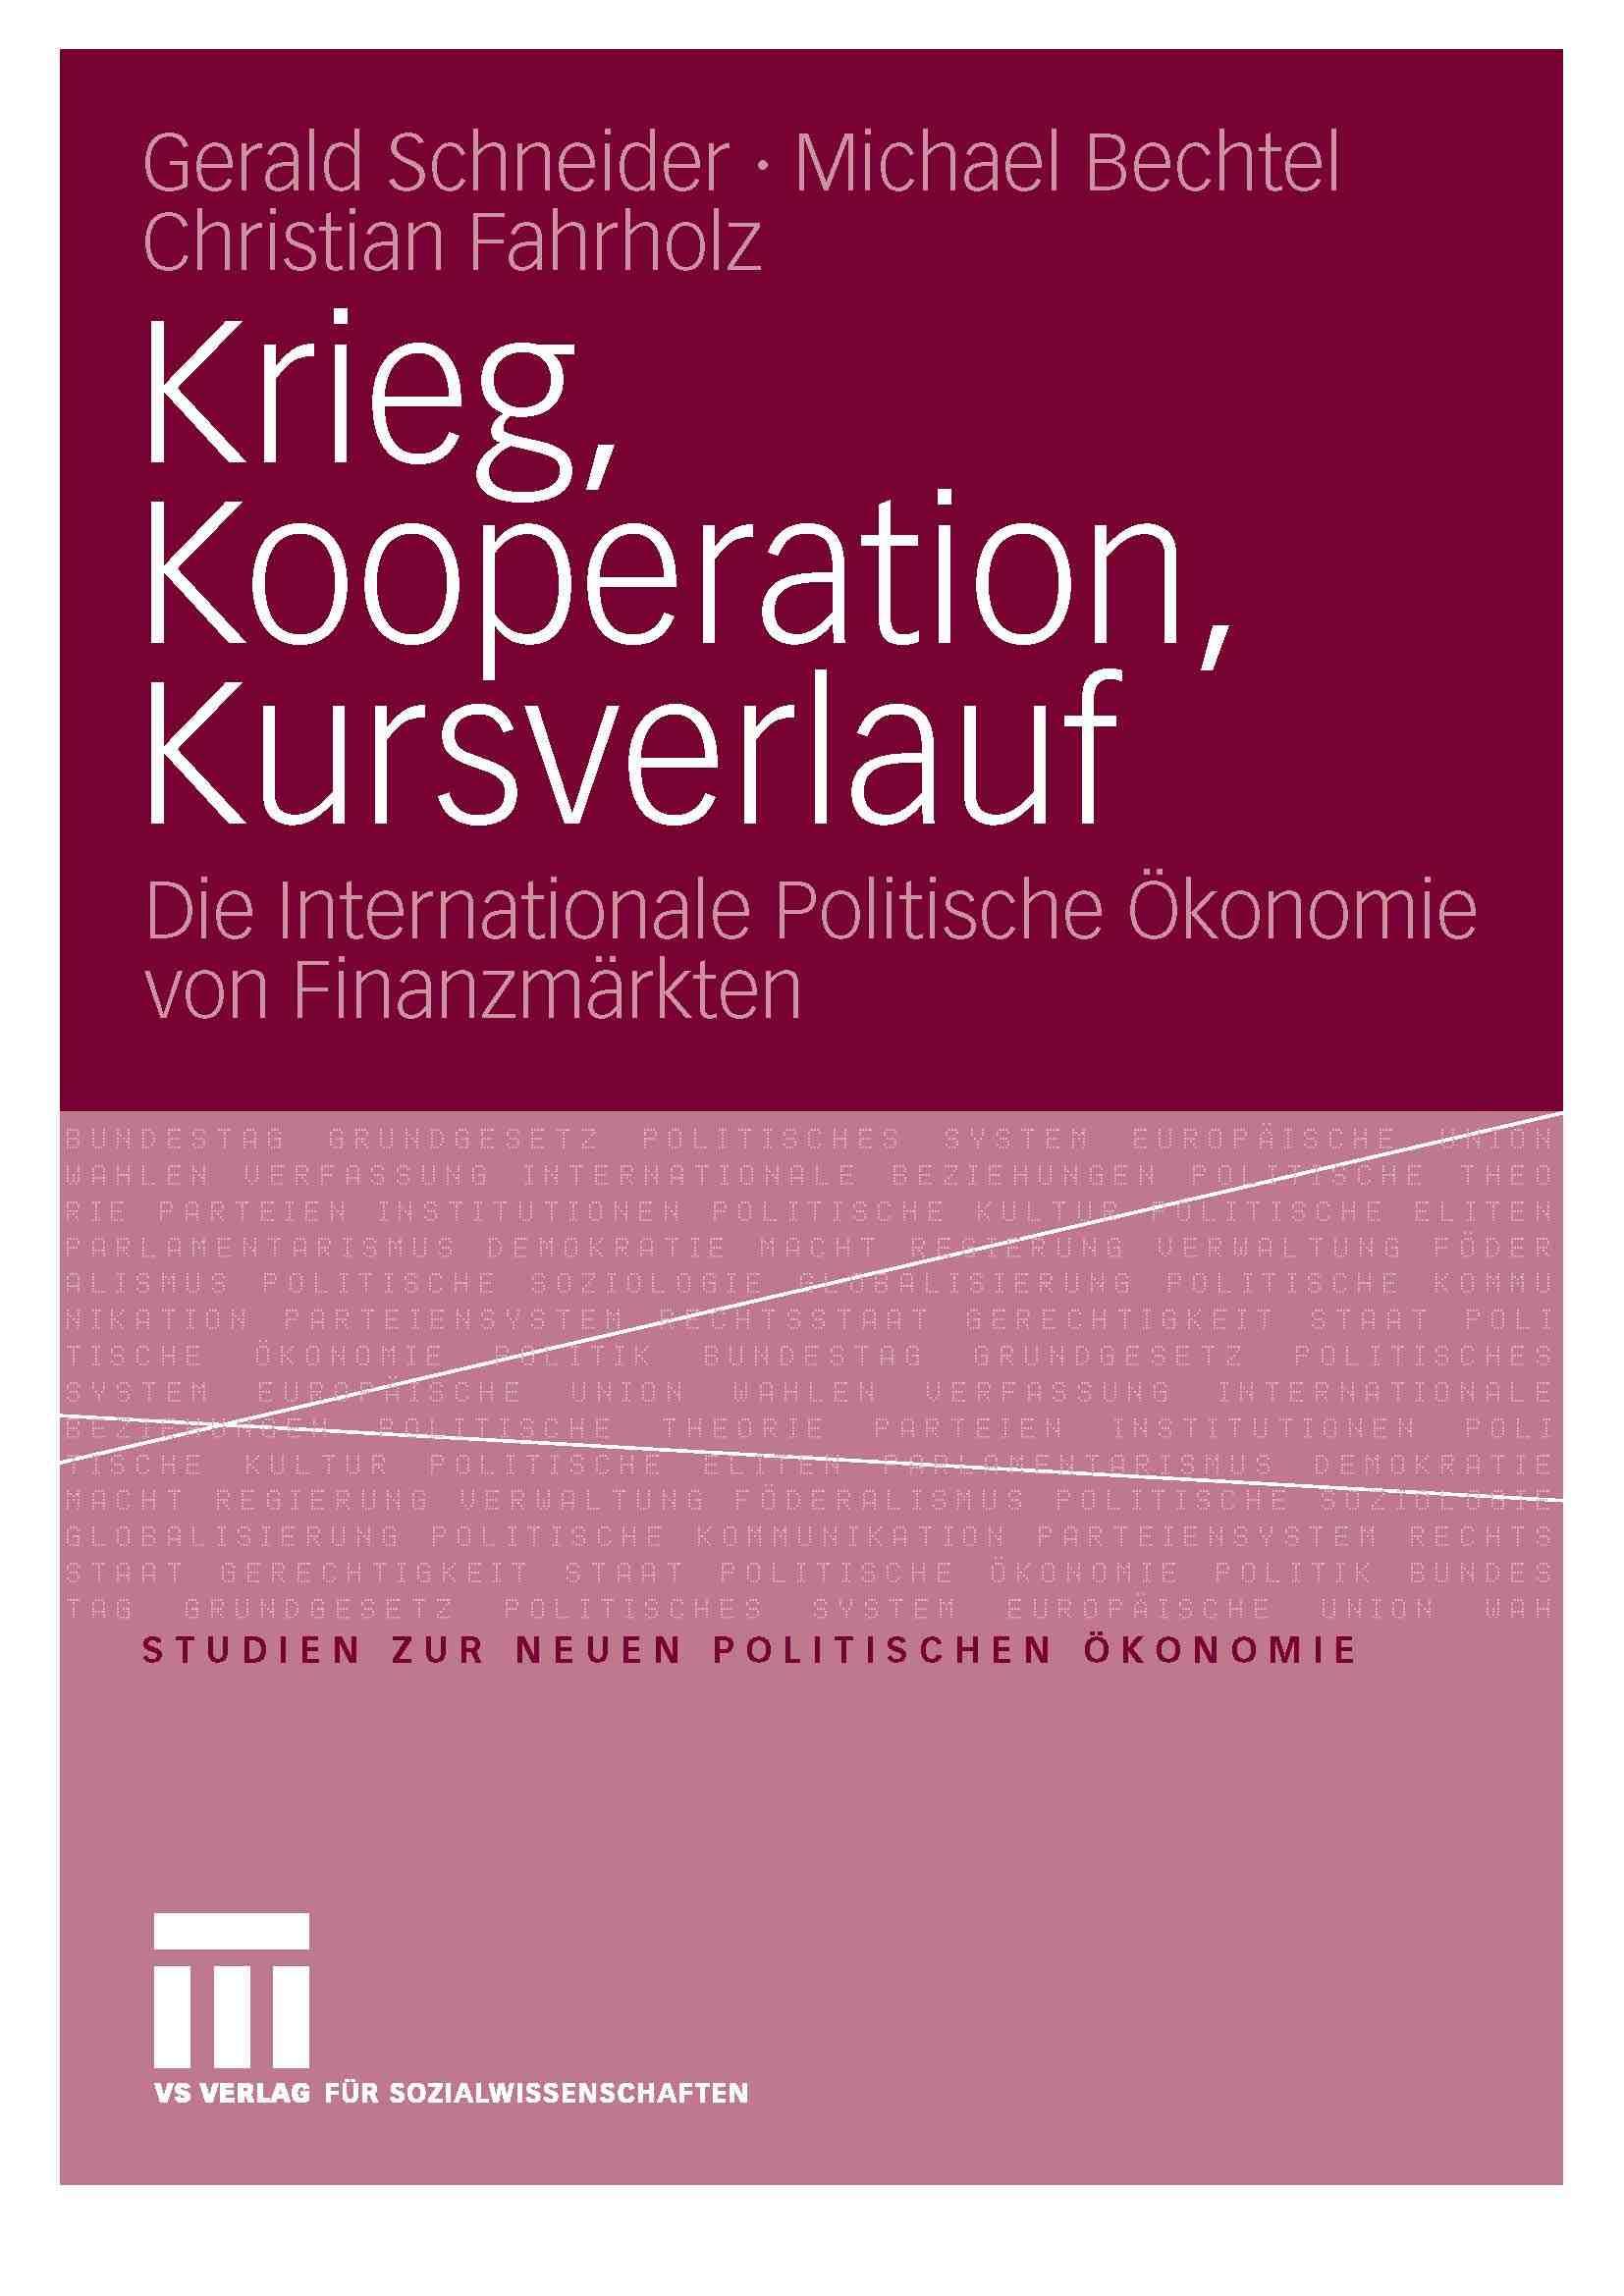 Dissertation publications